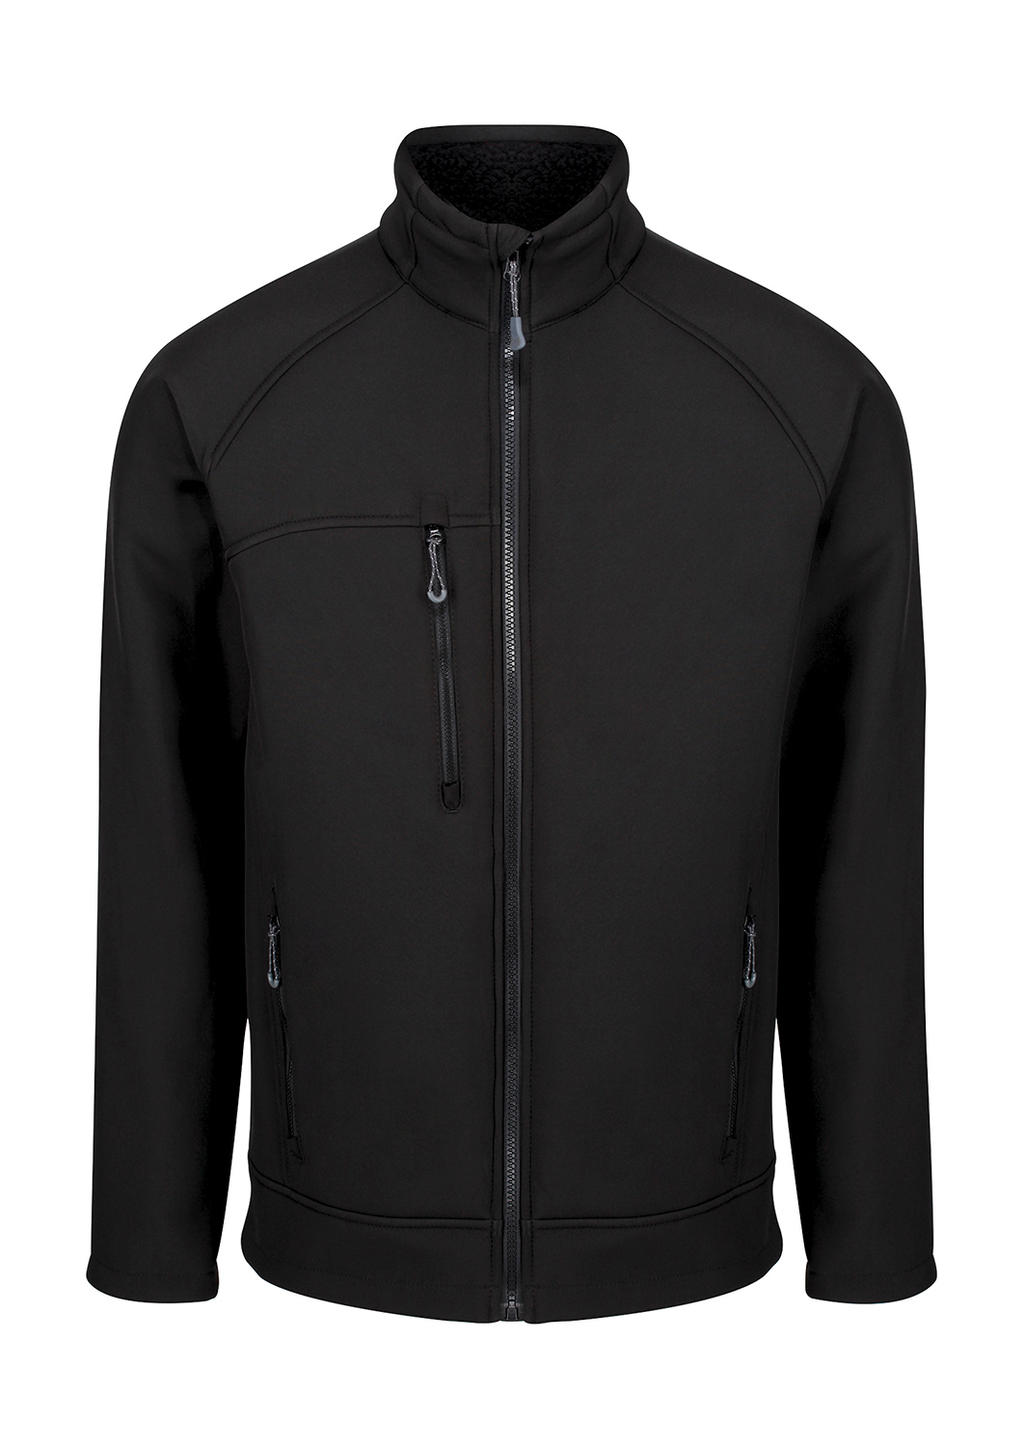 Softshell bunda Northway Premium - zvìtšit obrázek